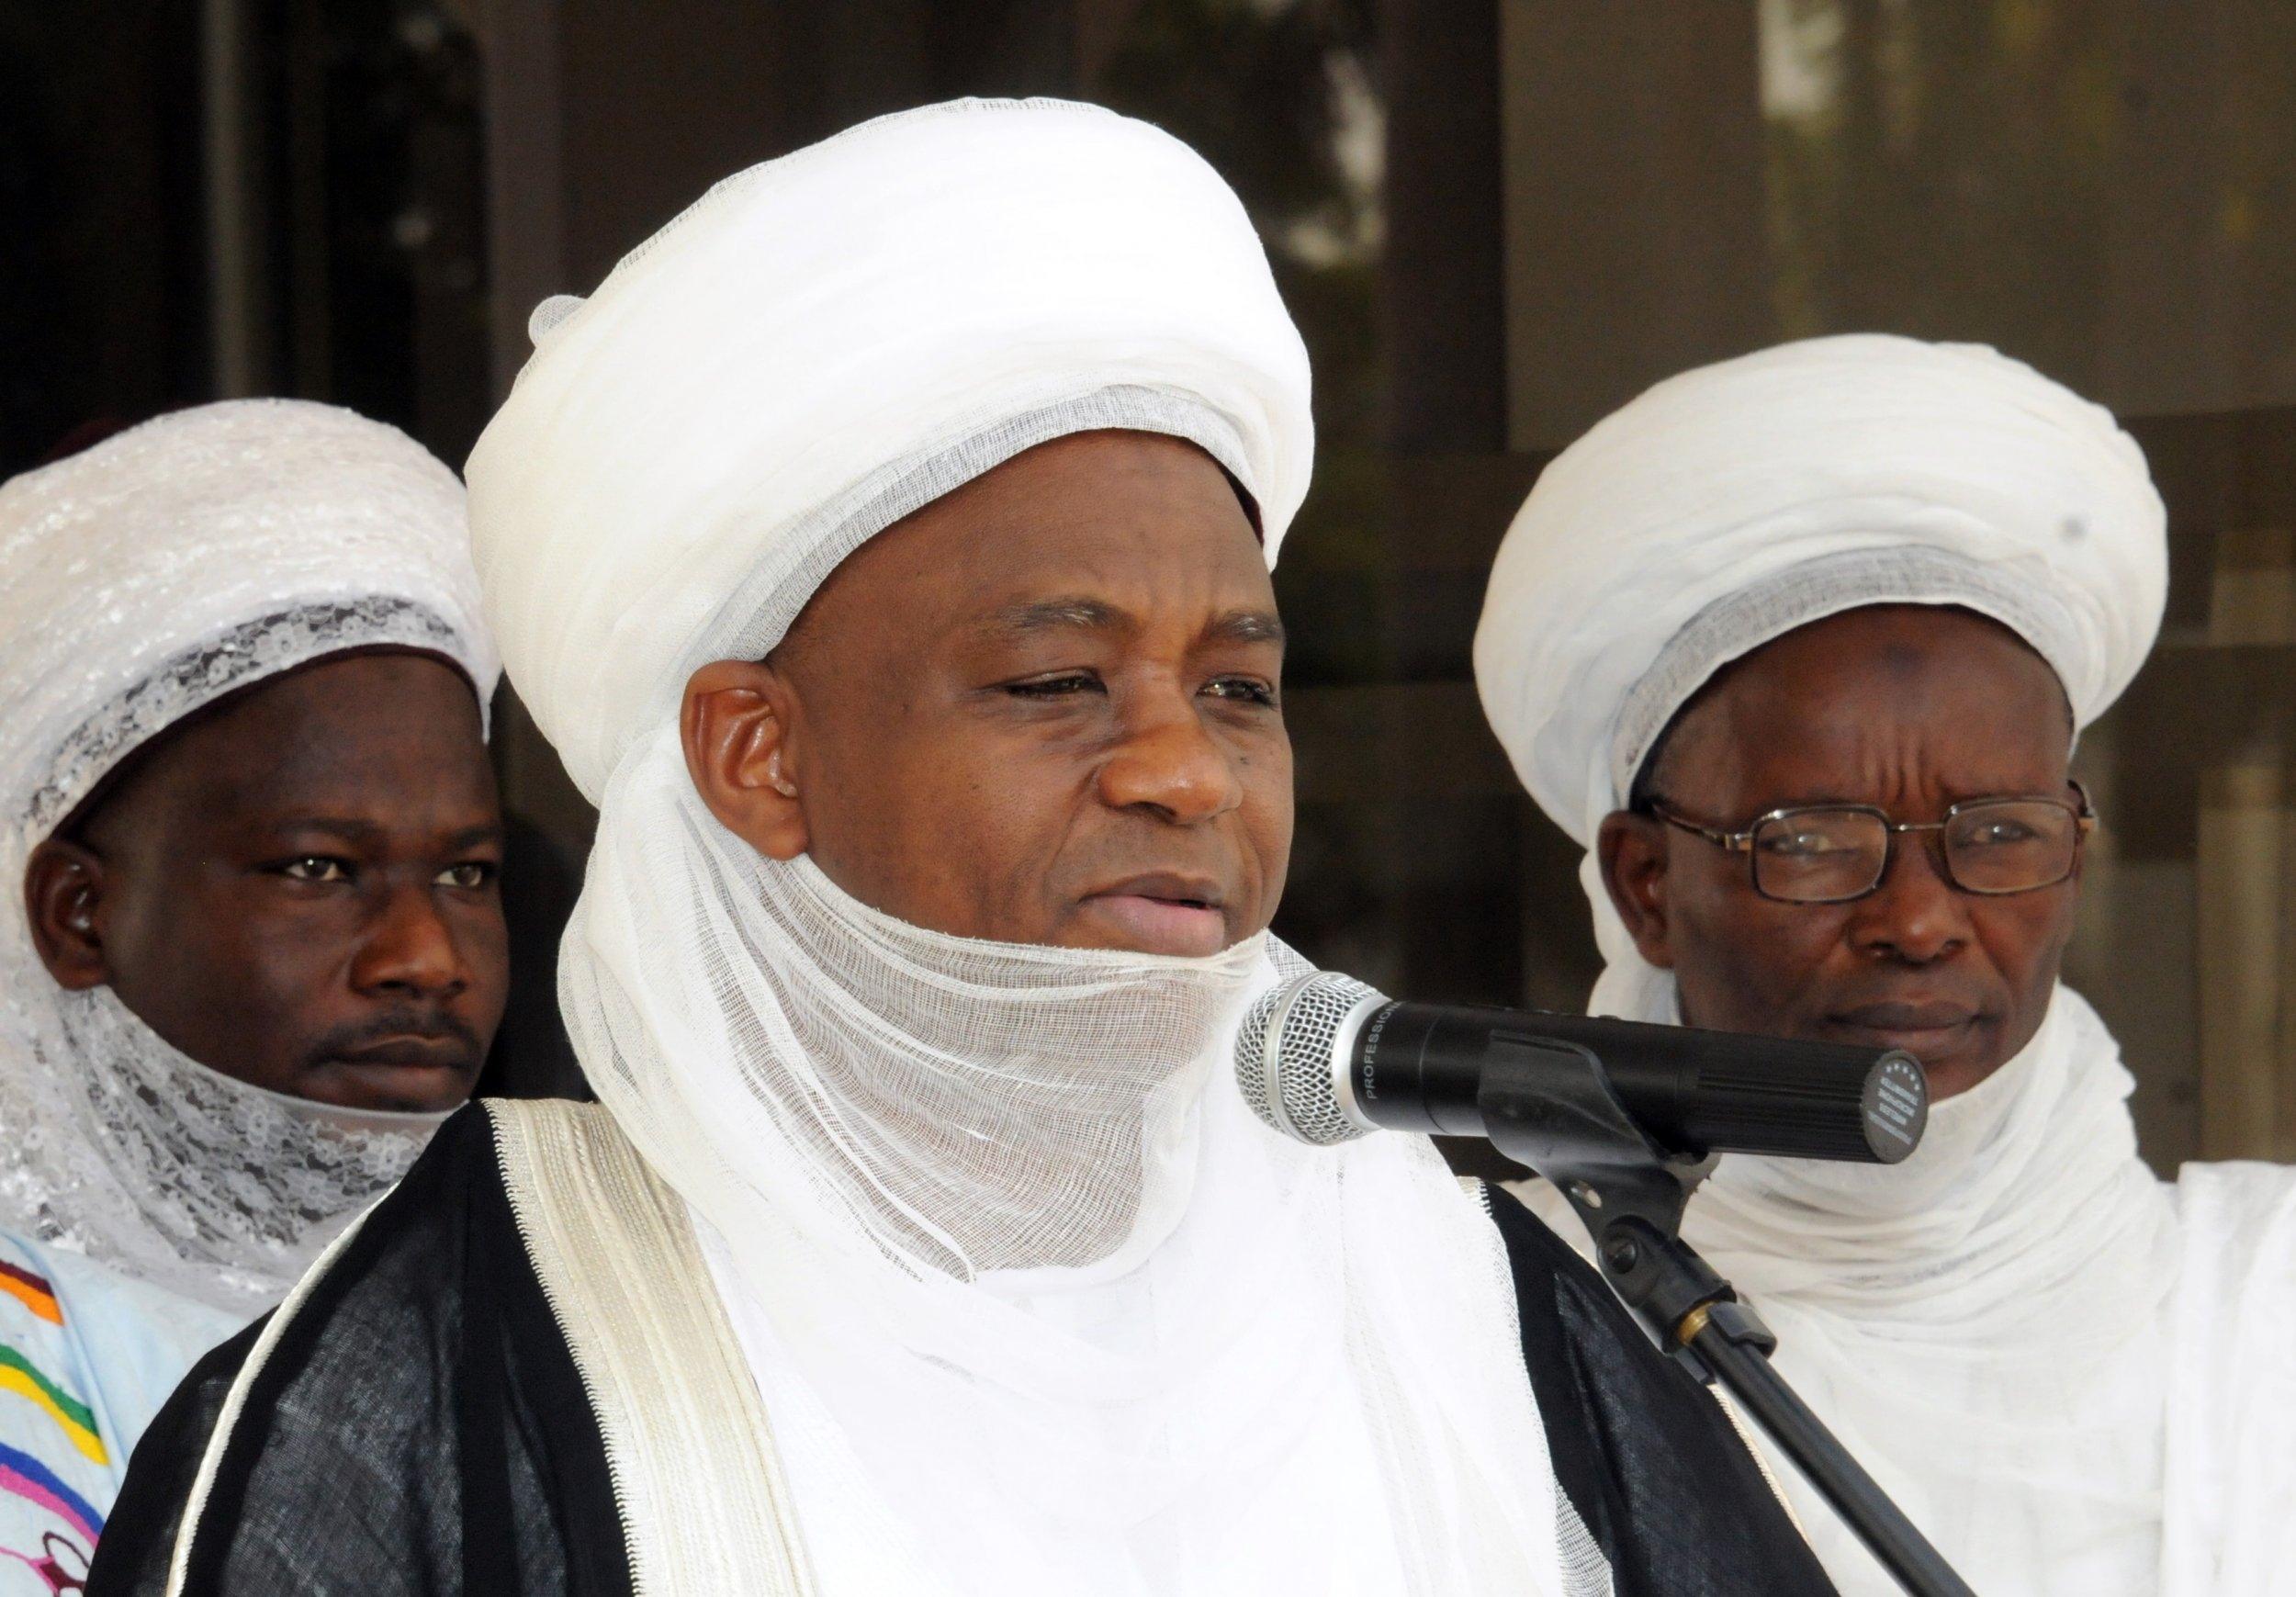 Sultan of Sokoto Nigeria